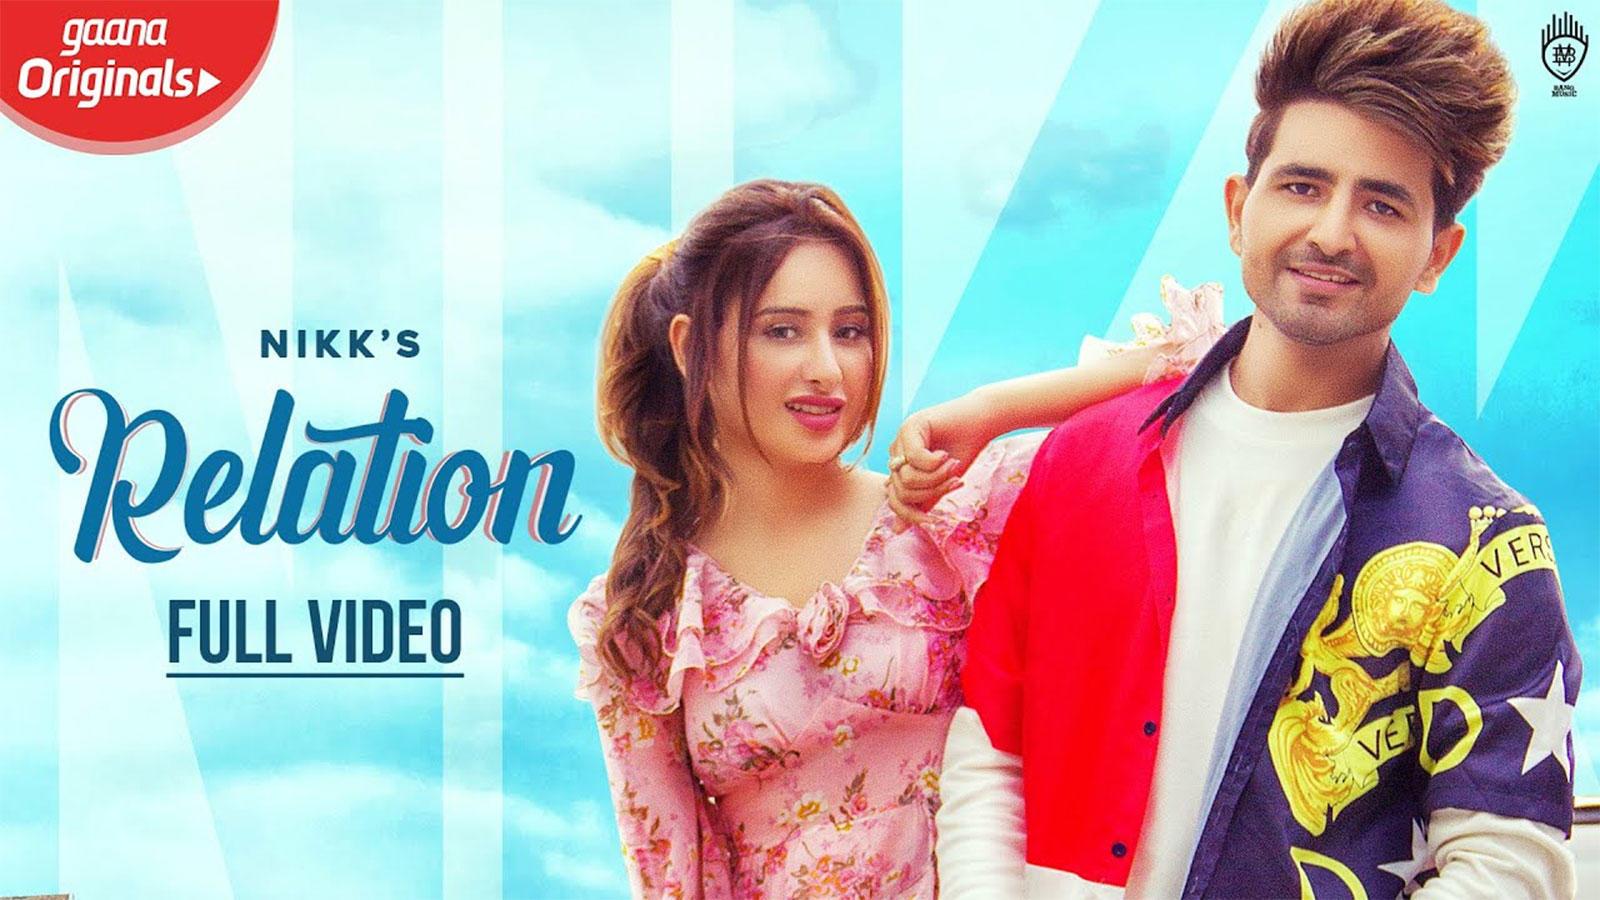 Latest Punjabi Song 'Relation' Sung By Nikk Featuring Mahira Sharma